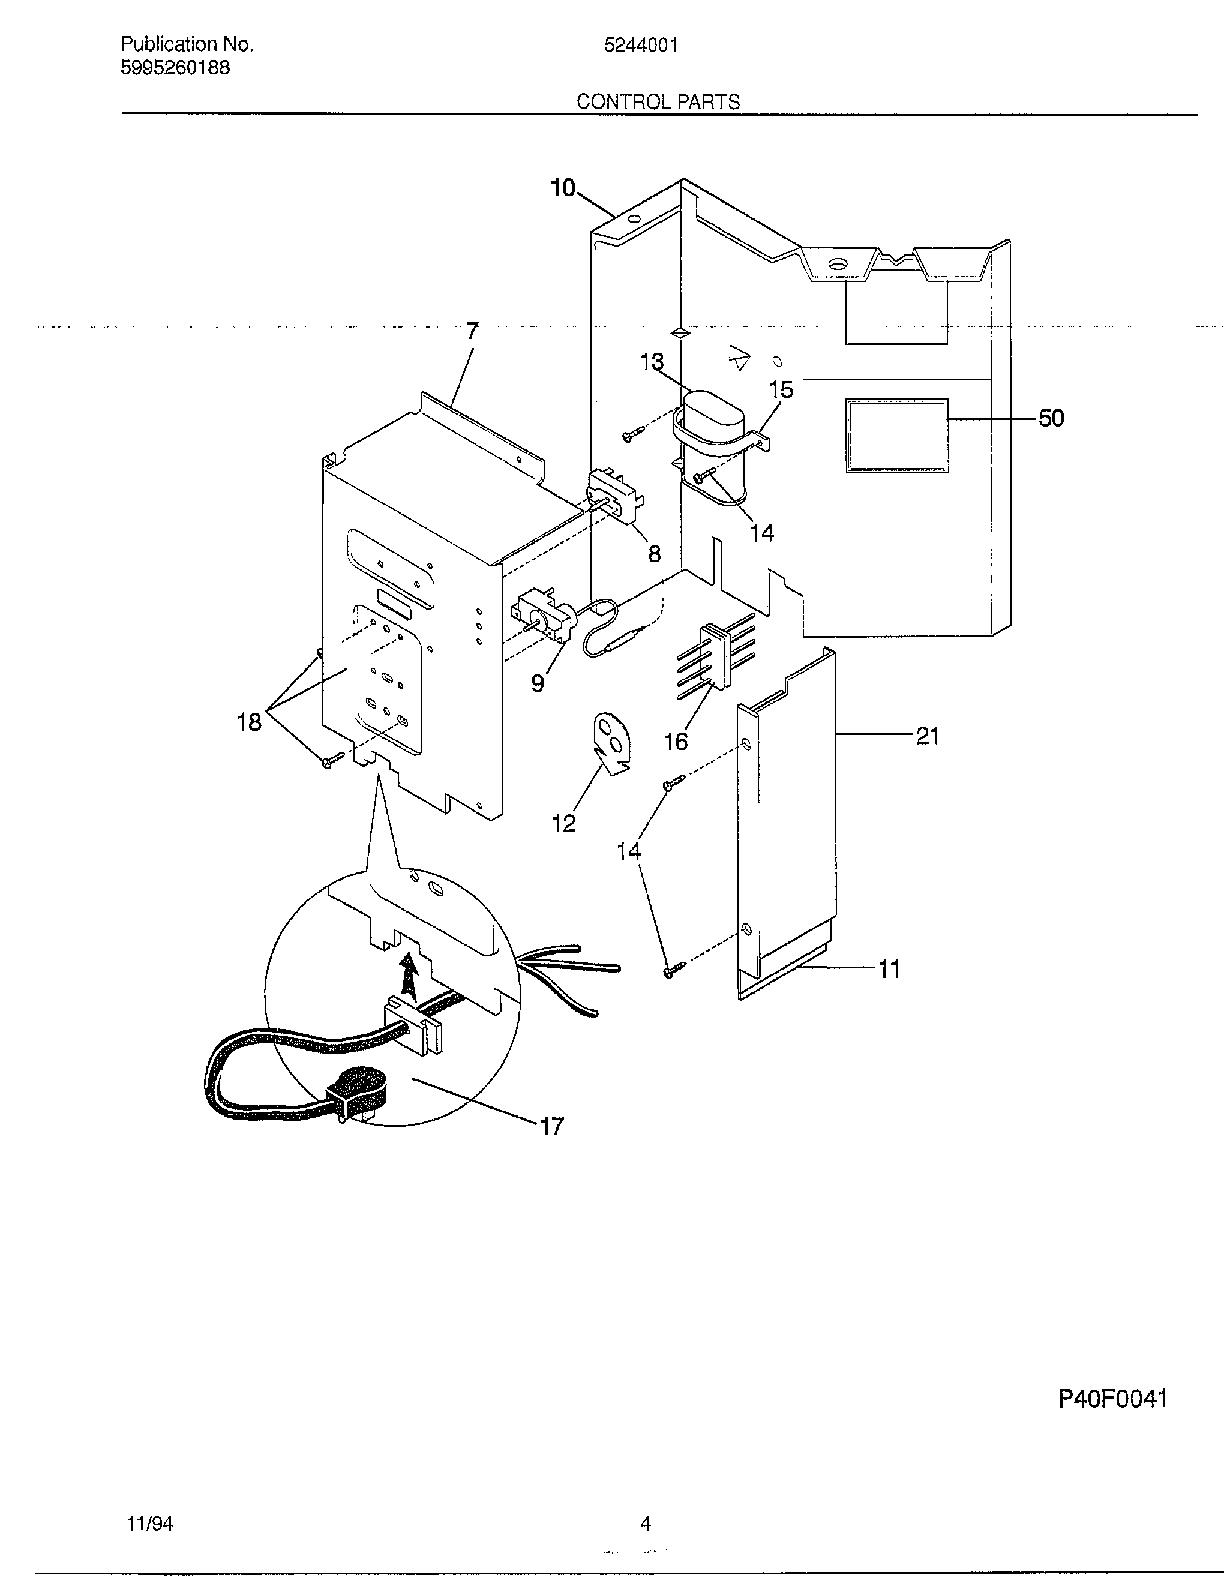 Frigidaire Window Air Conditioner Diagram, Frigidaire